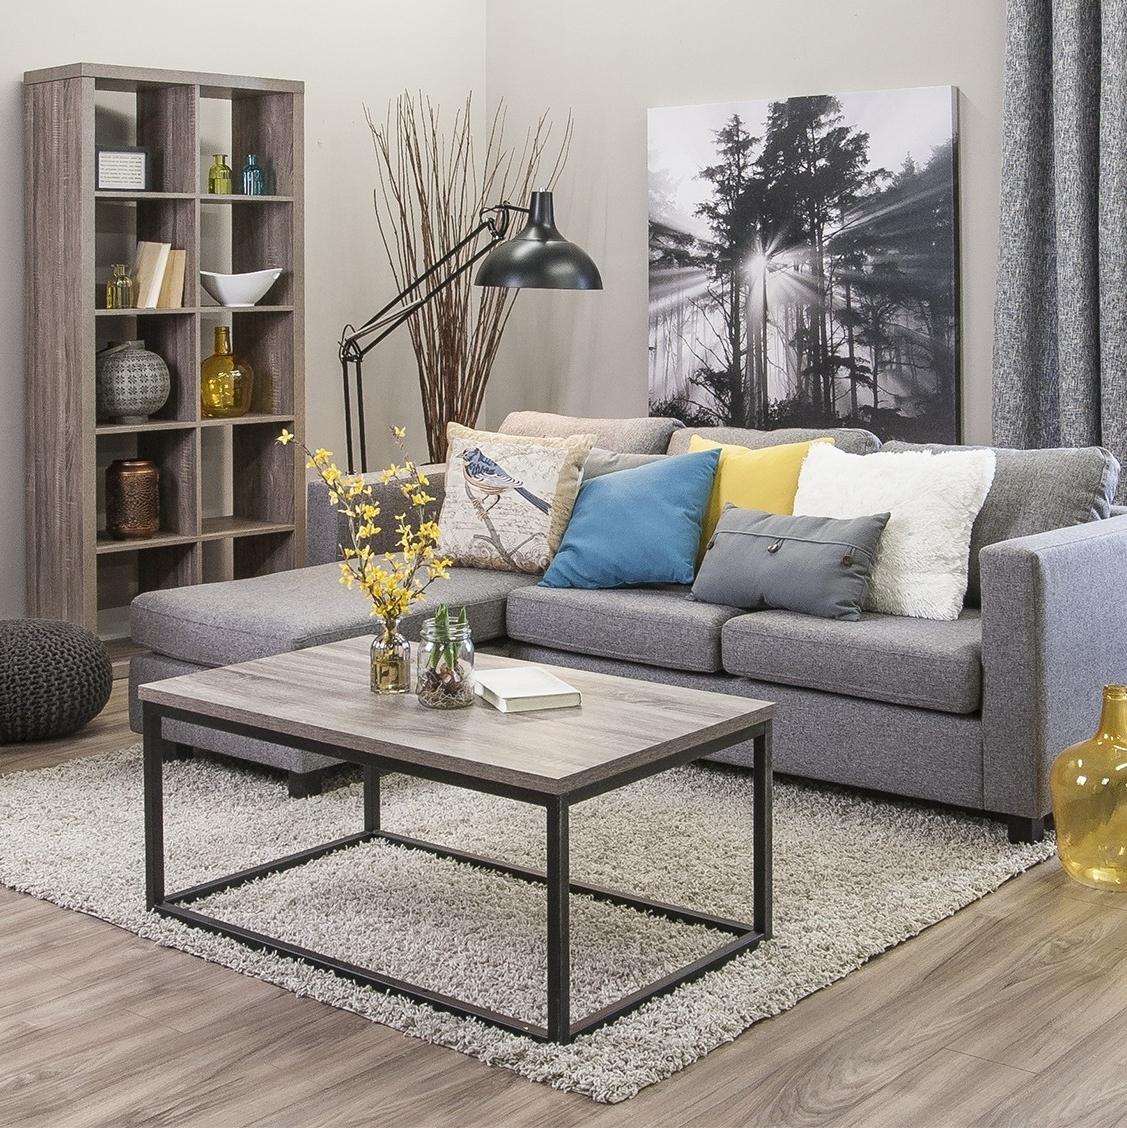 Casa Corner Sofa (Grey) Regarding Most Current Jysk Sectional Sofas (View 4 of 15)